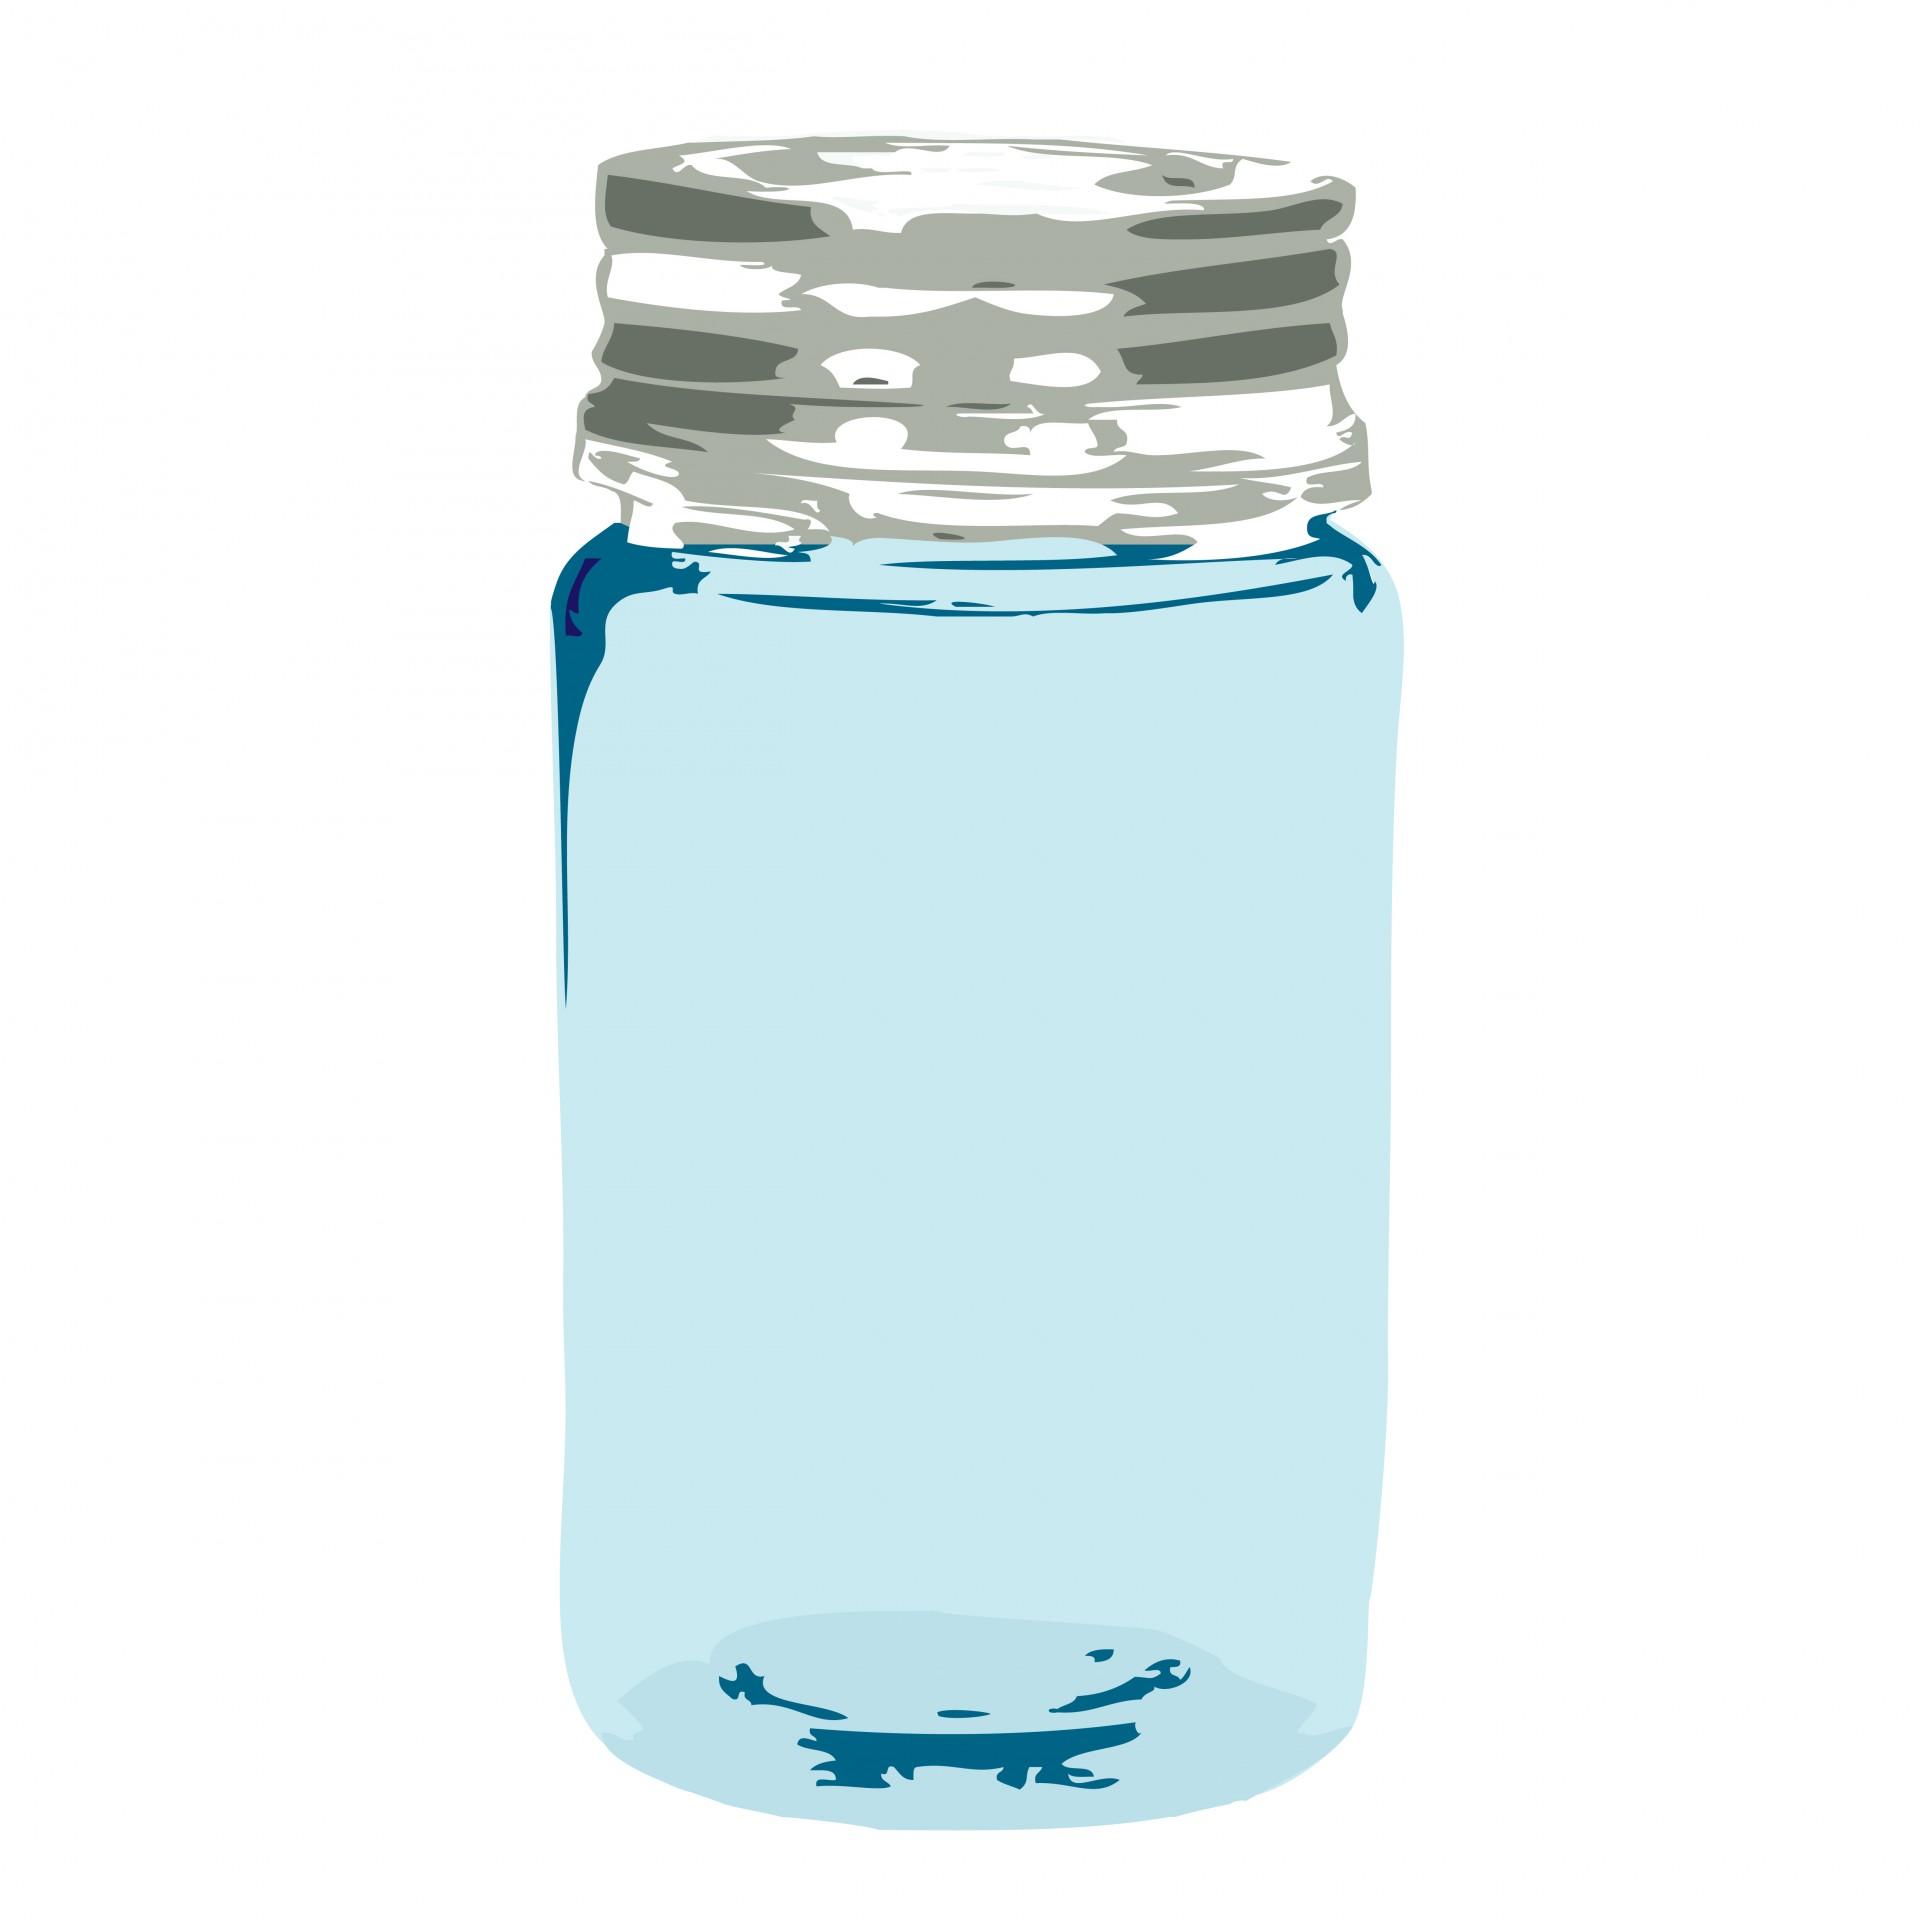 Mason Jar clipart glass jar  Jar Pictures Blue Images